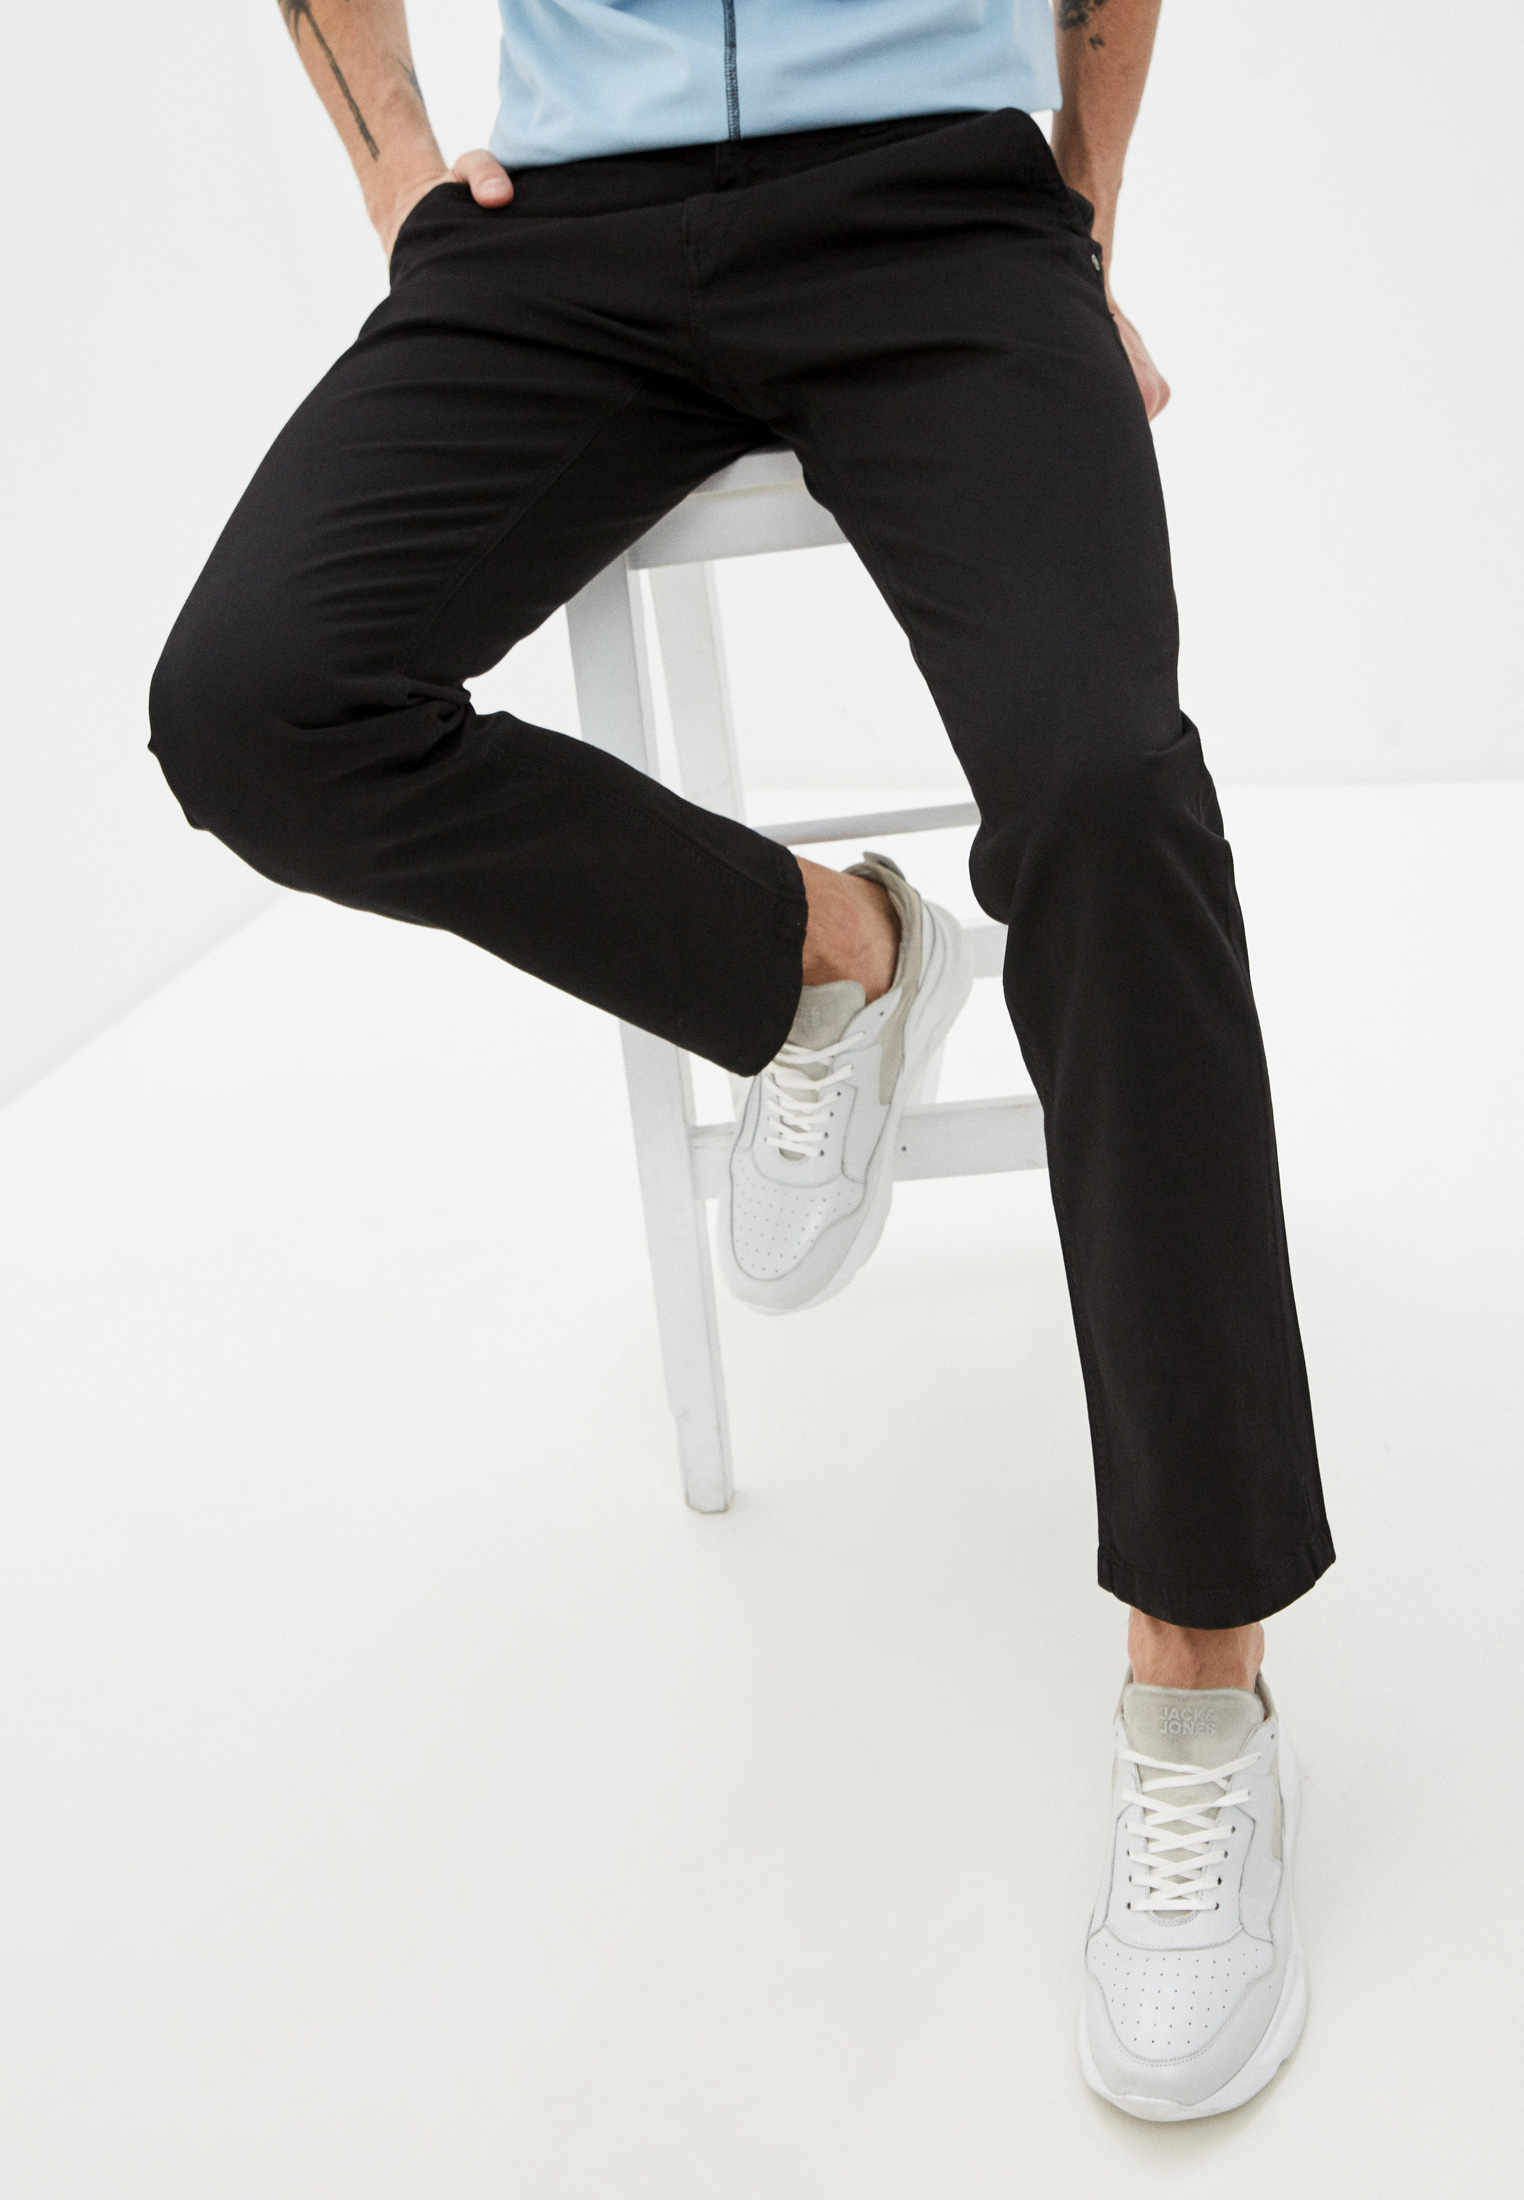 Мужские повседневные брюки Bikkembergs (Биккембергс) C P 111 00 S 3394